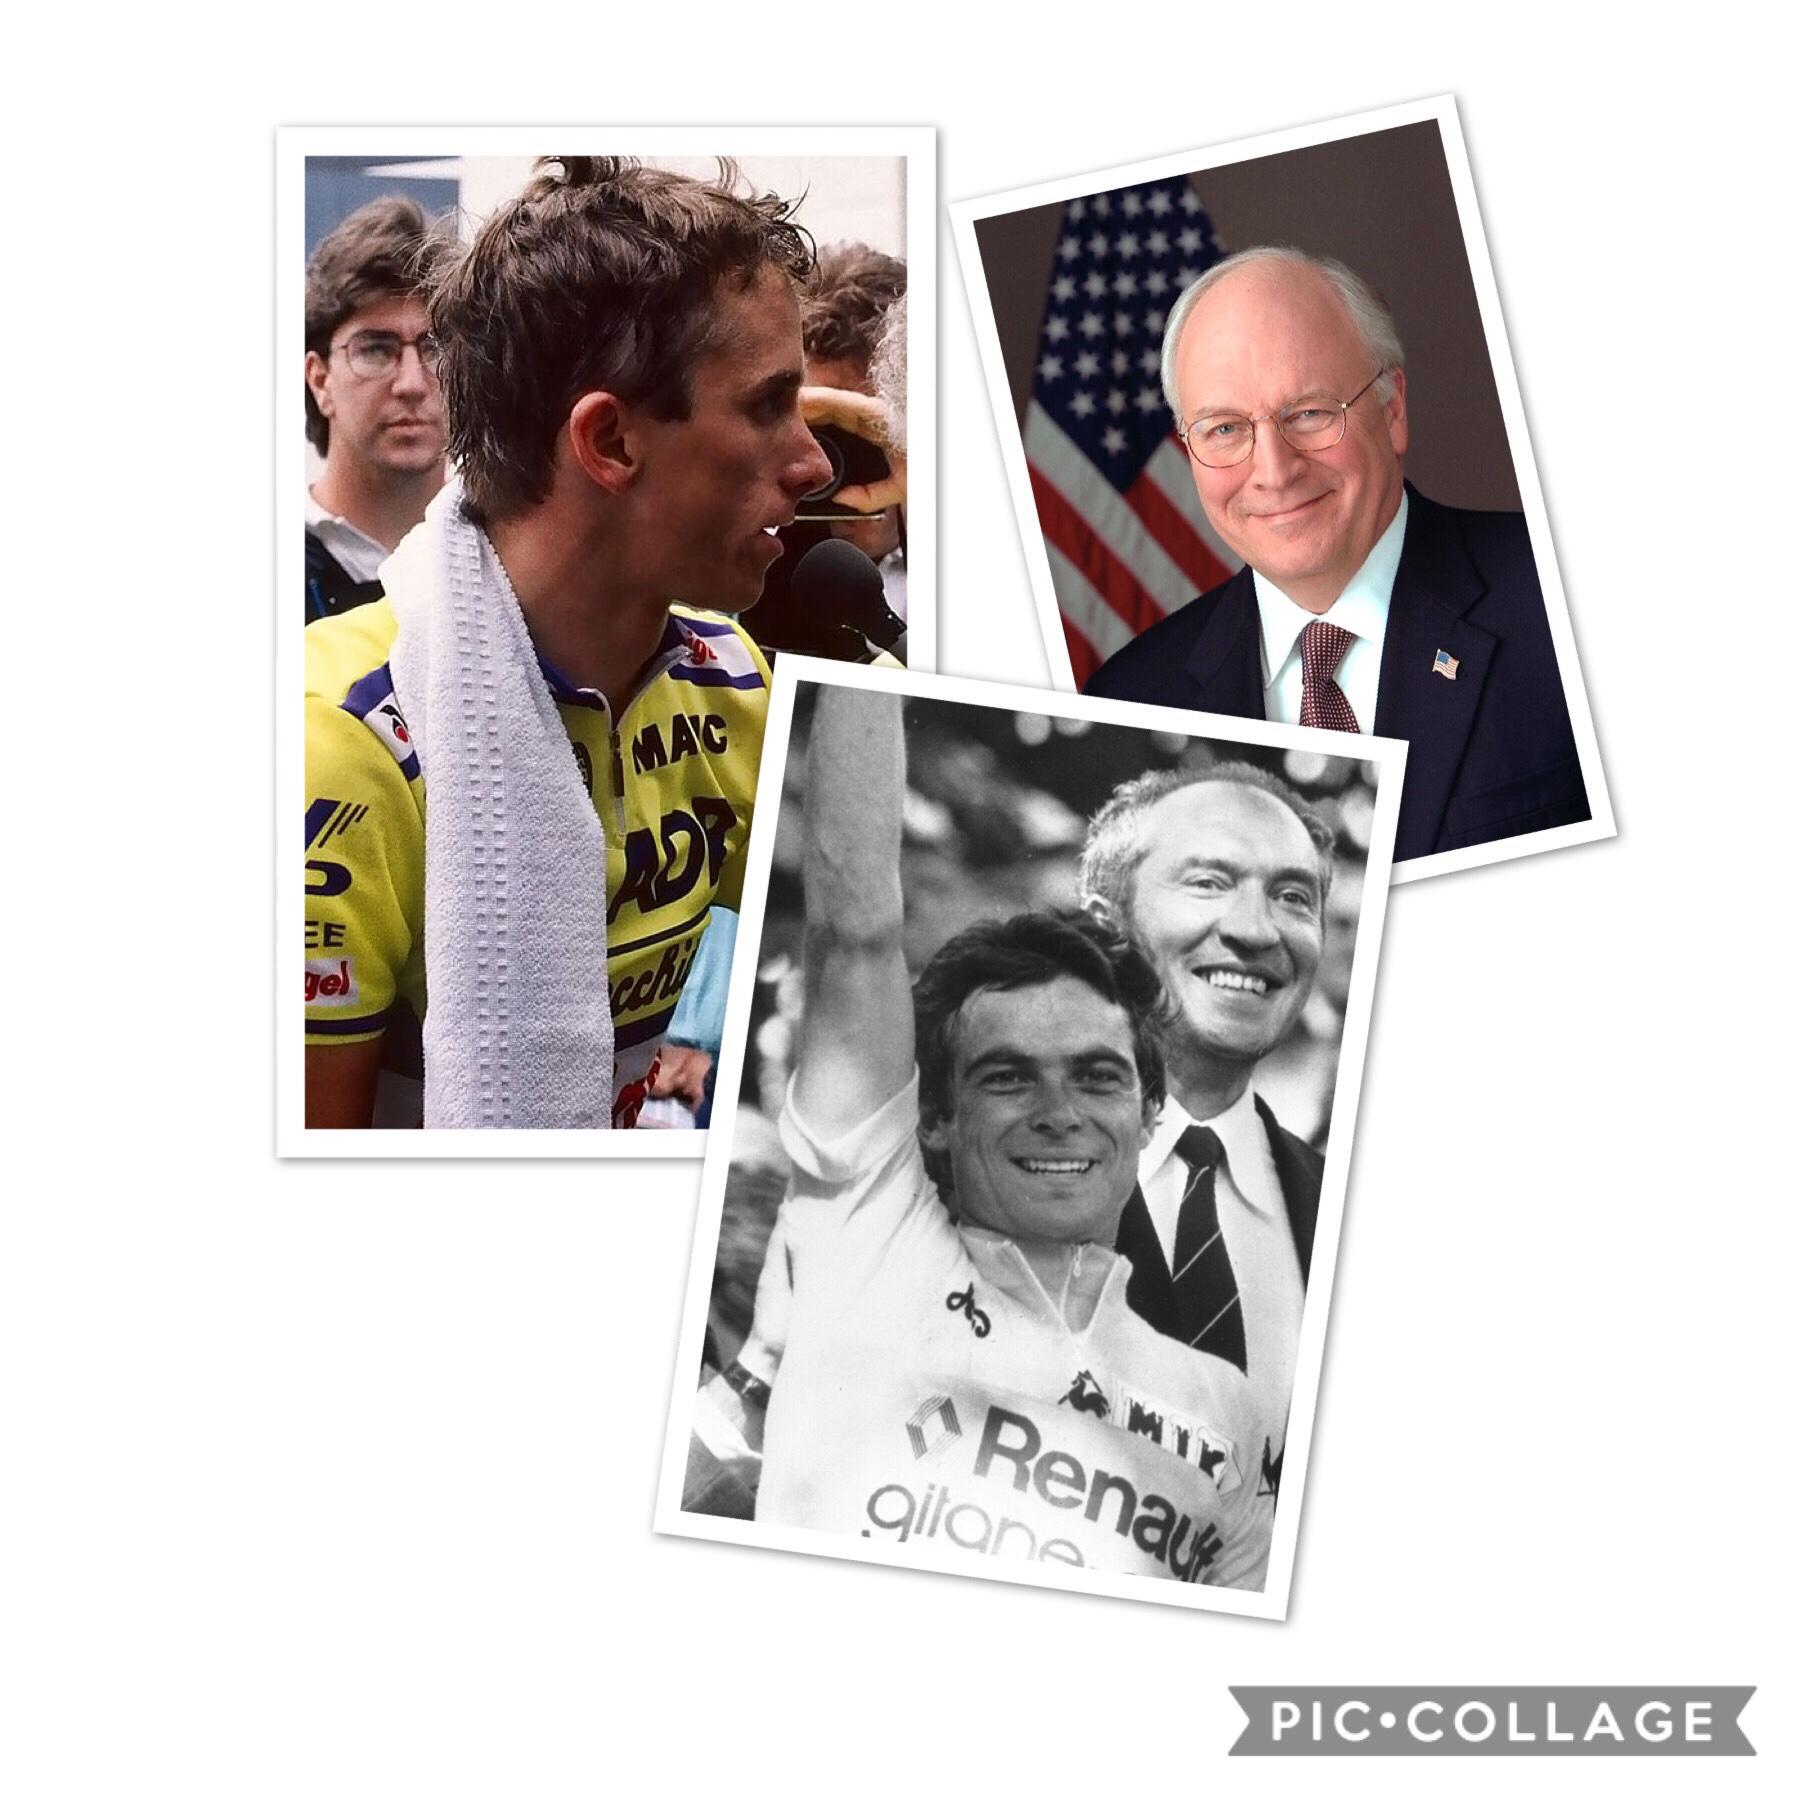 Hinault Lemond Cheney